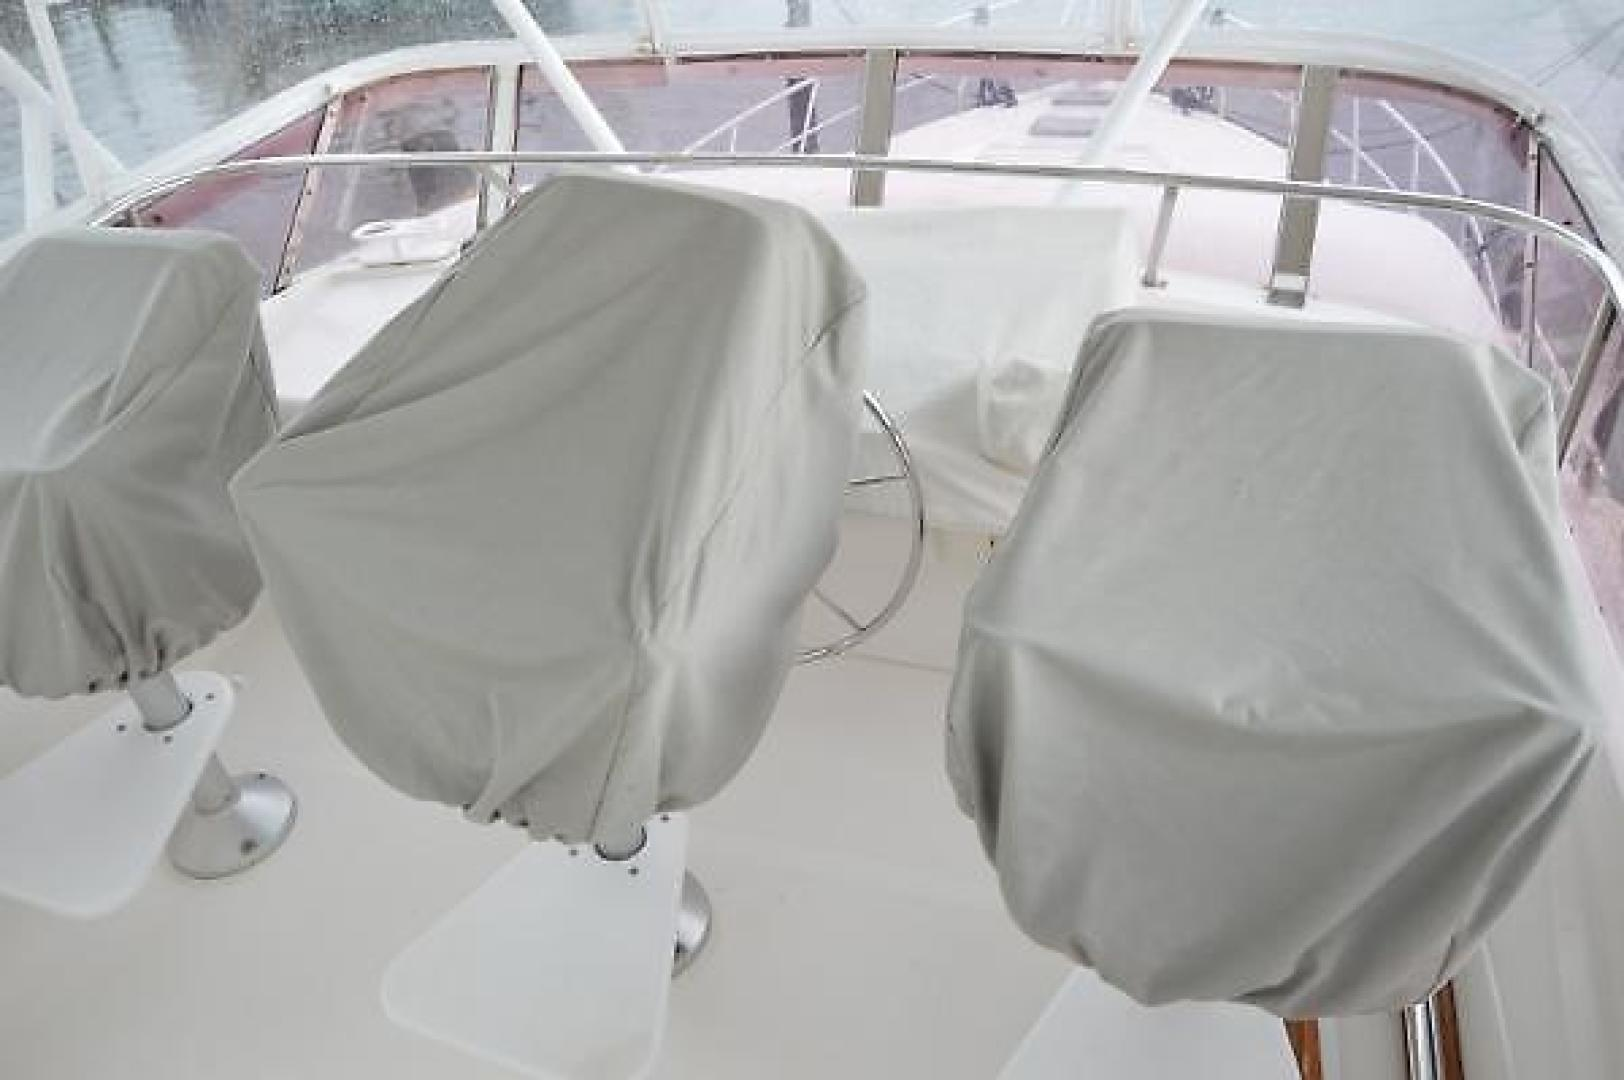 Neptunus-55 Motor Yacht 1997-Sea Venture III Hampton-Virginia-United States-1355274 | Thumbnail